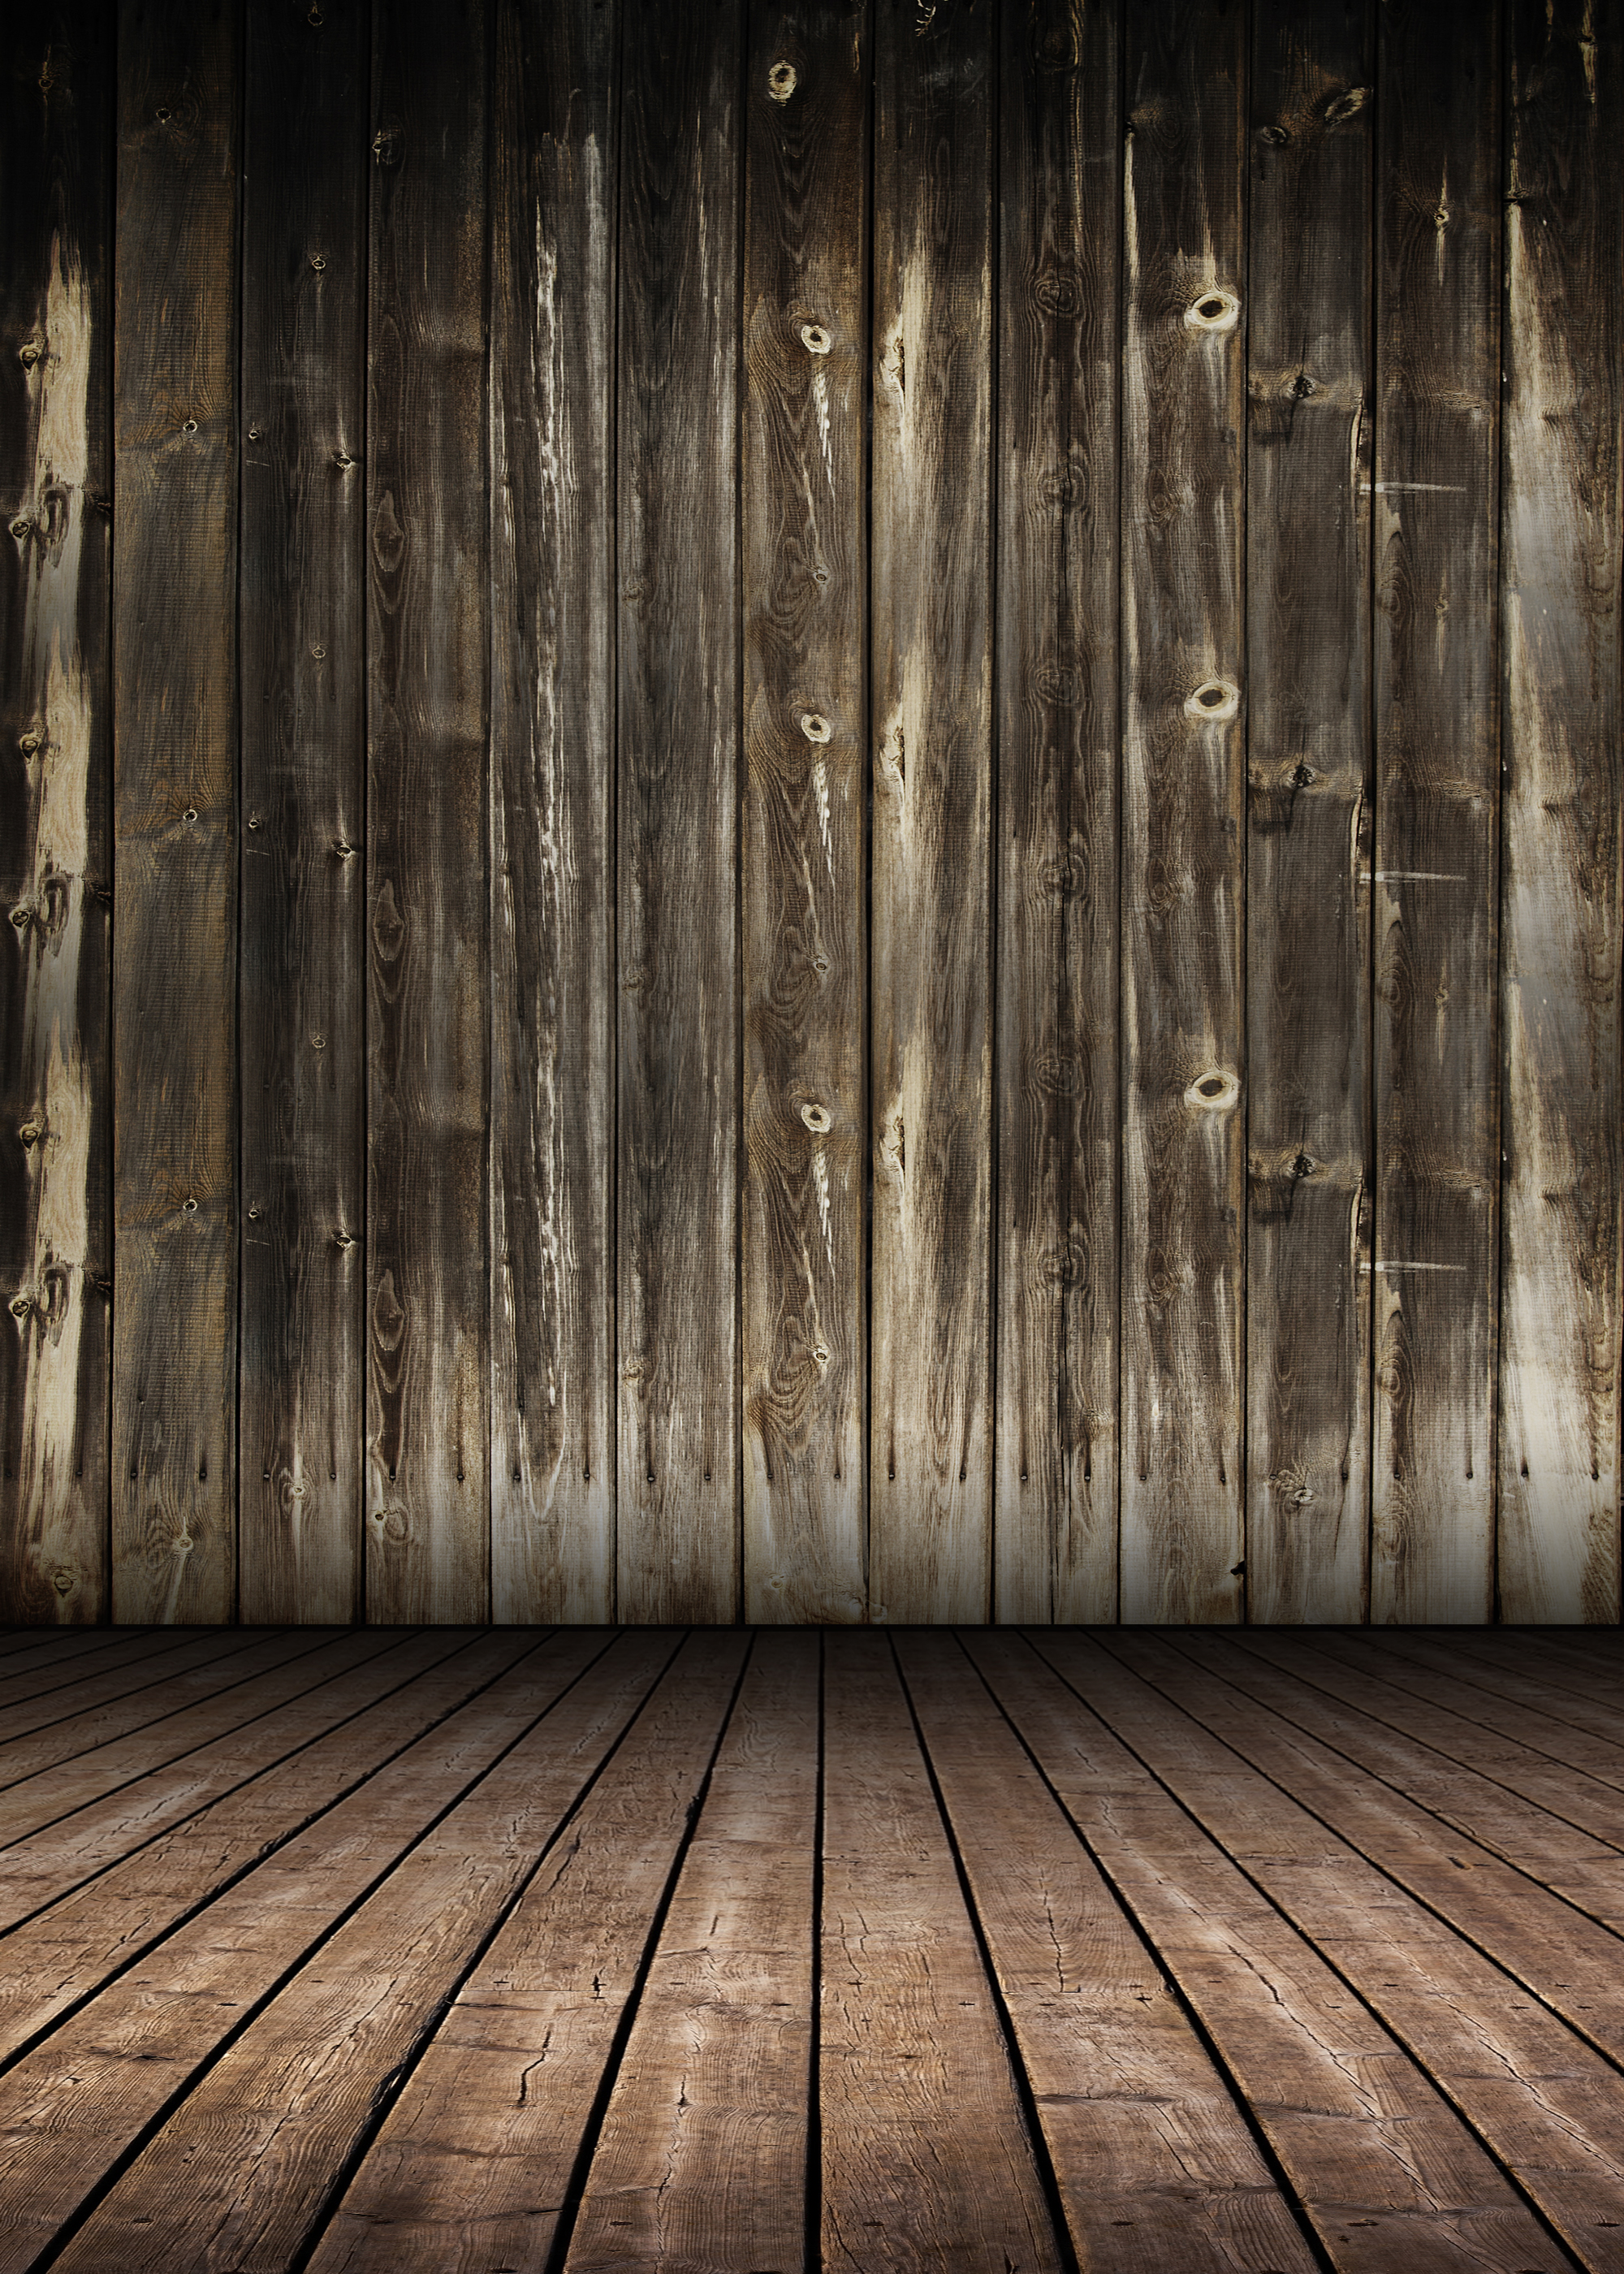 backdrop floor wood wooden background backgrounds fabric custom studios huayi shabby